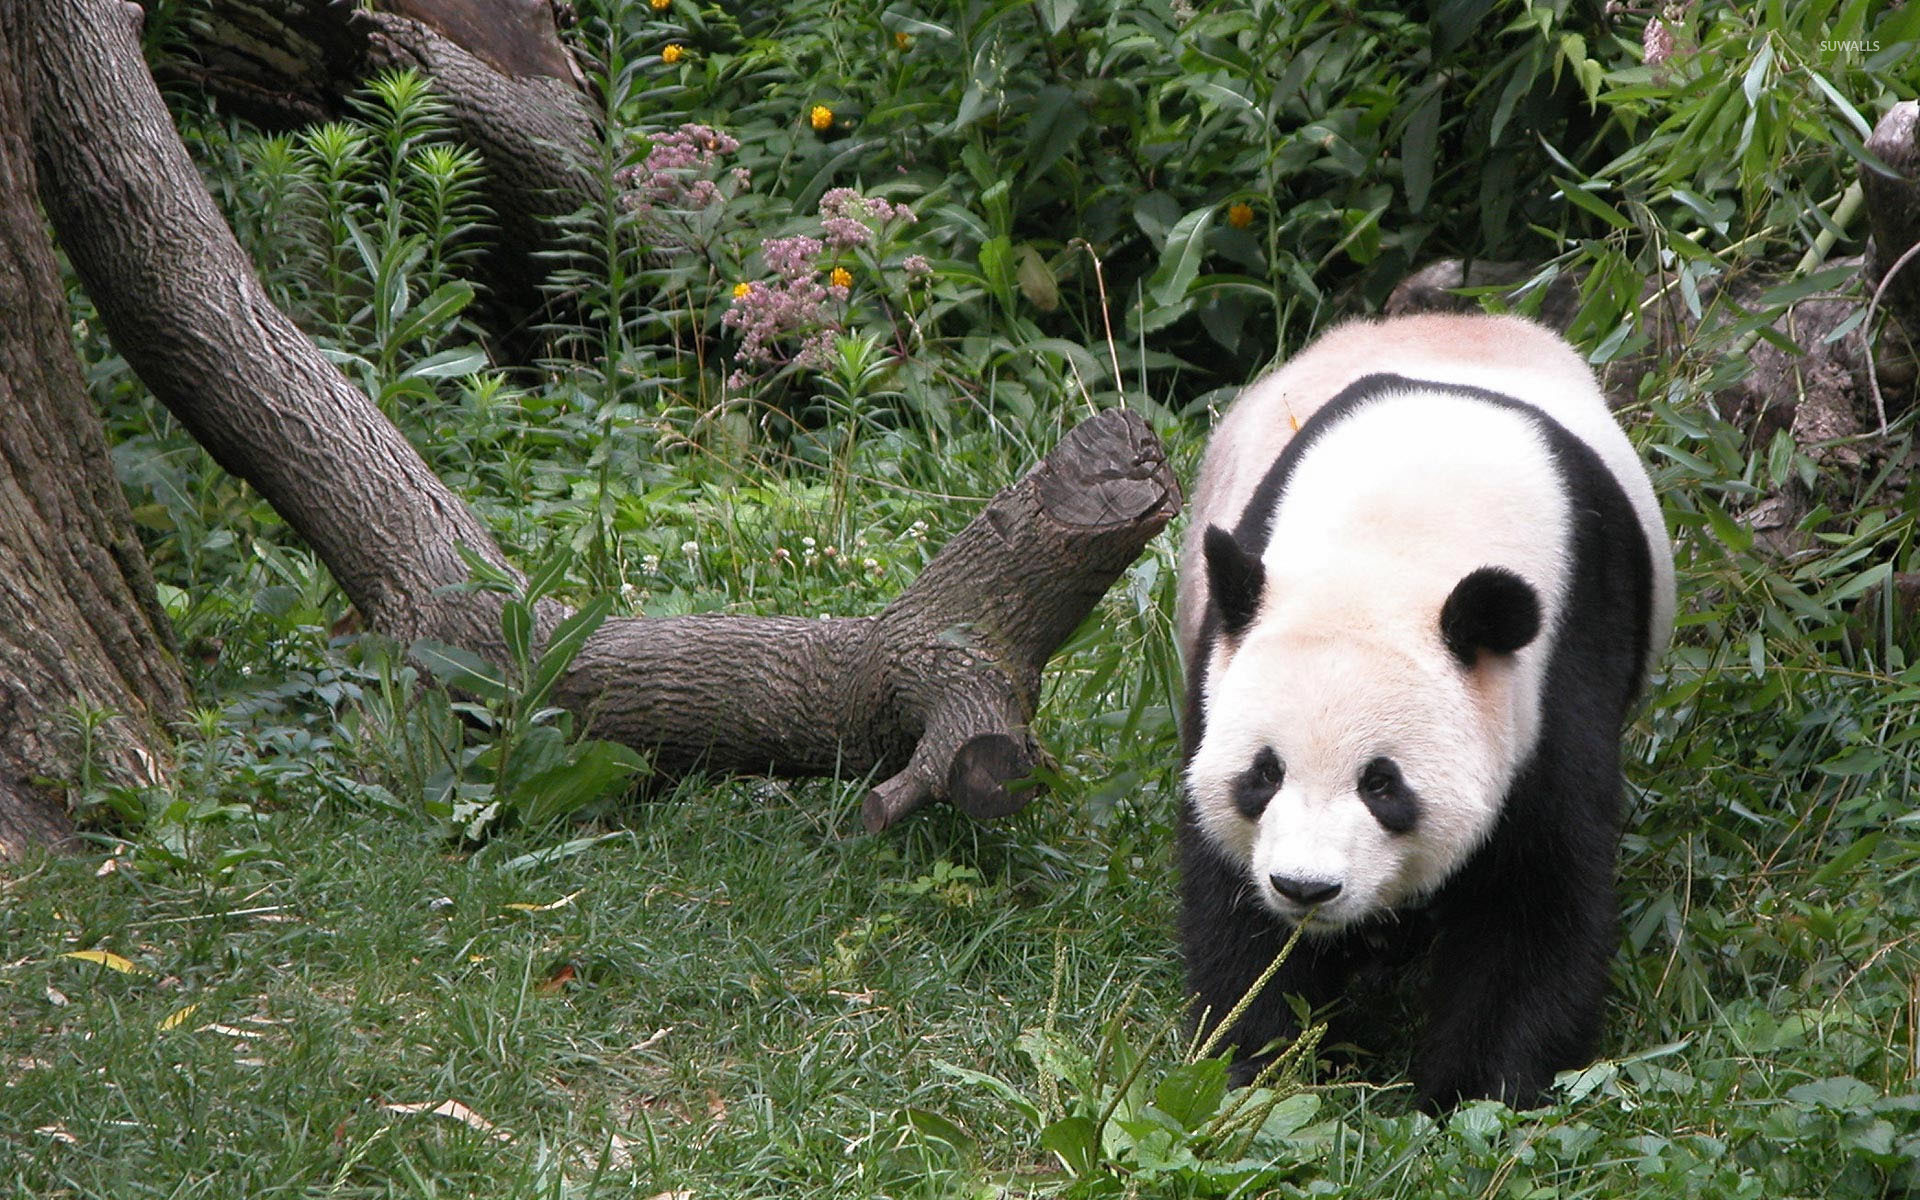 Panda Bear wallpaper - Animal